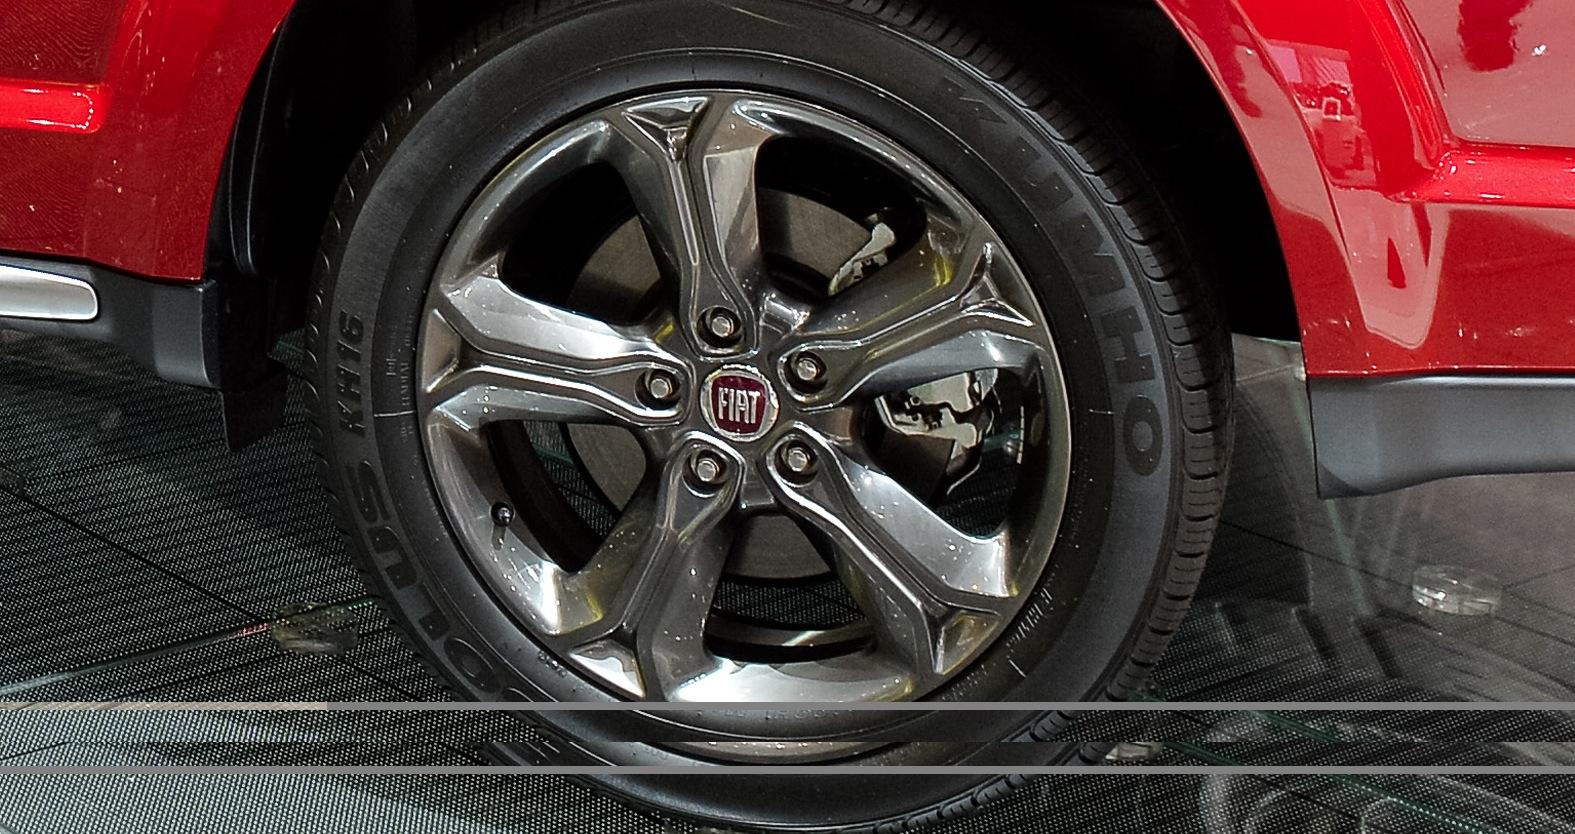 Saw Mill Auto >> 2014 Dodge Journey Crossroad Puts On Fiat Badge in Geneva [Live Photos] - autoevolution